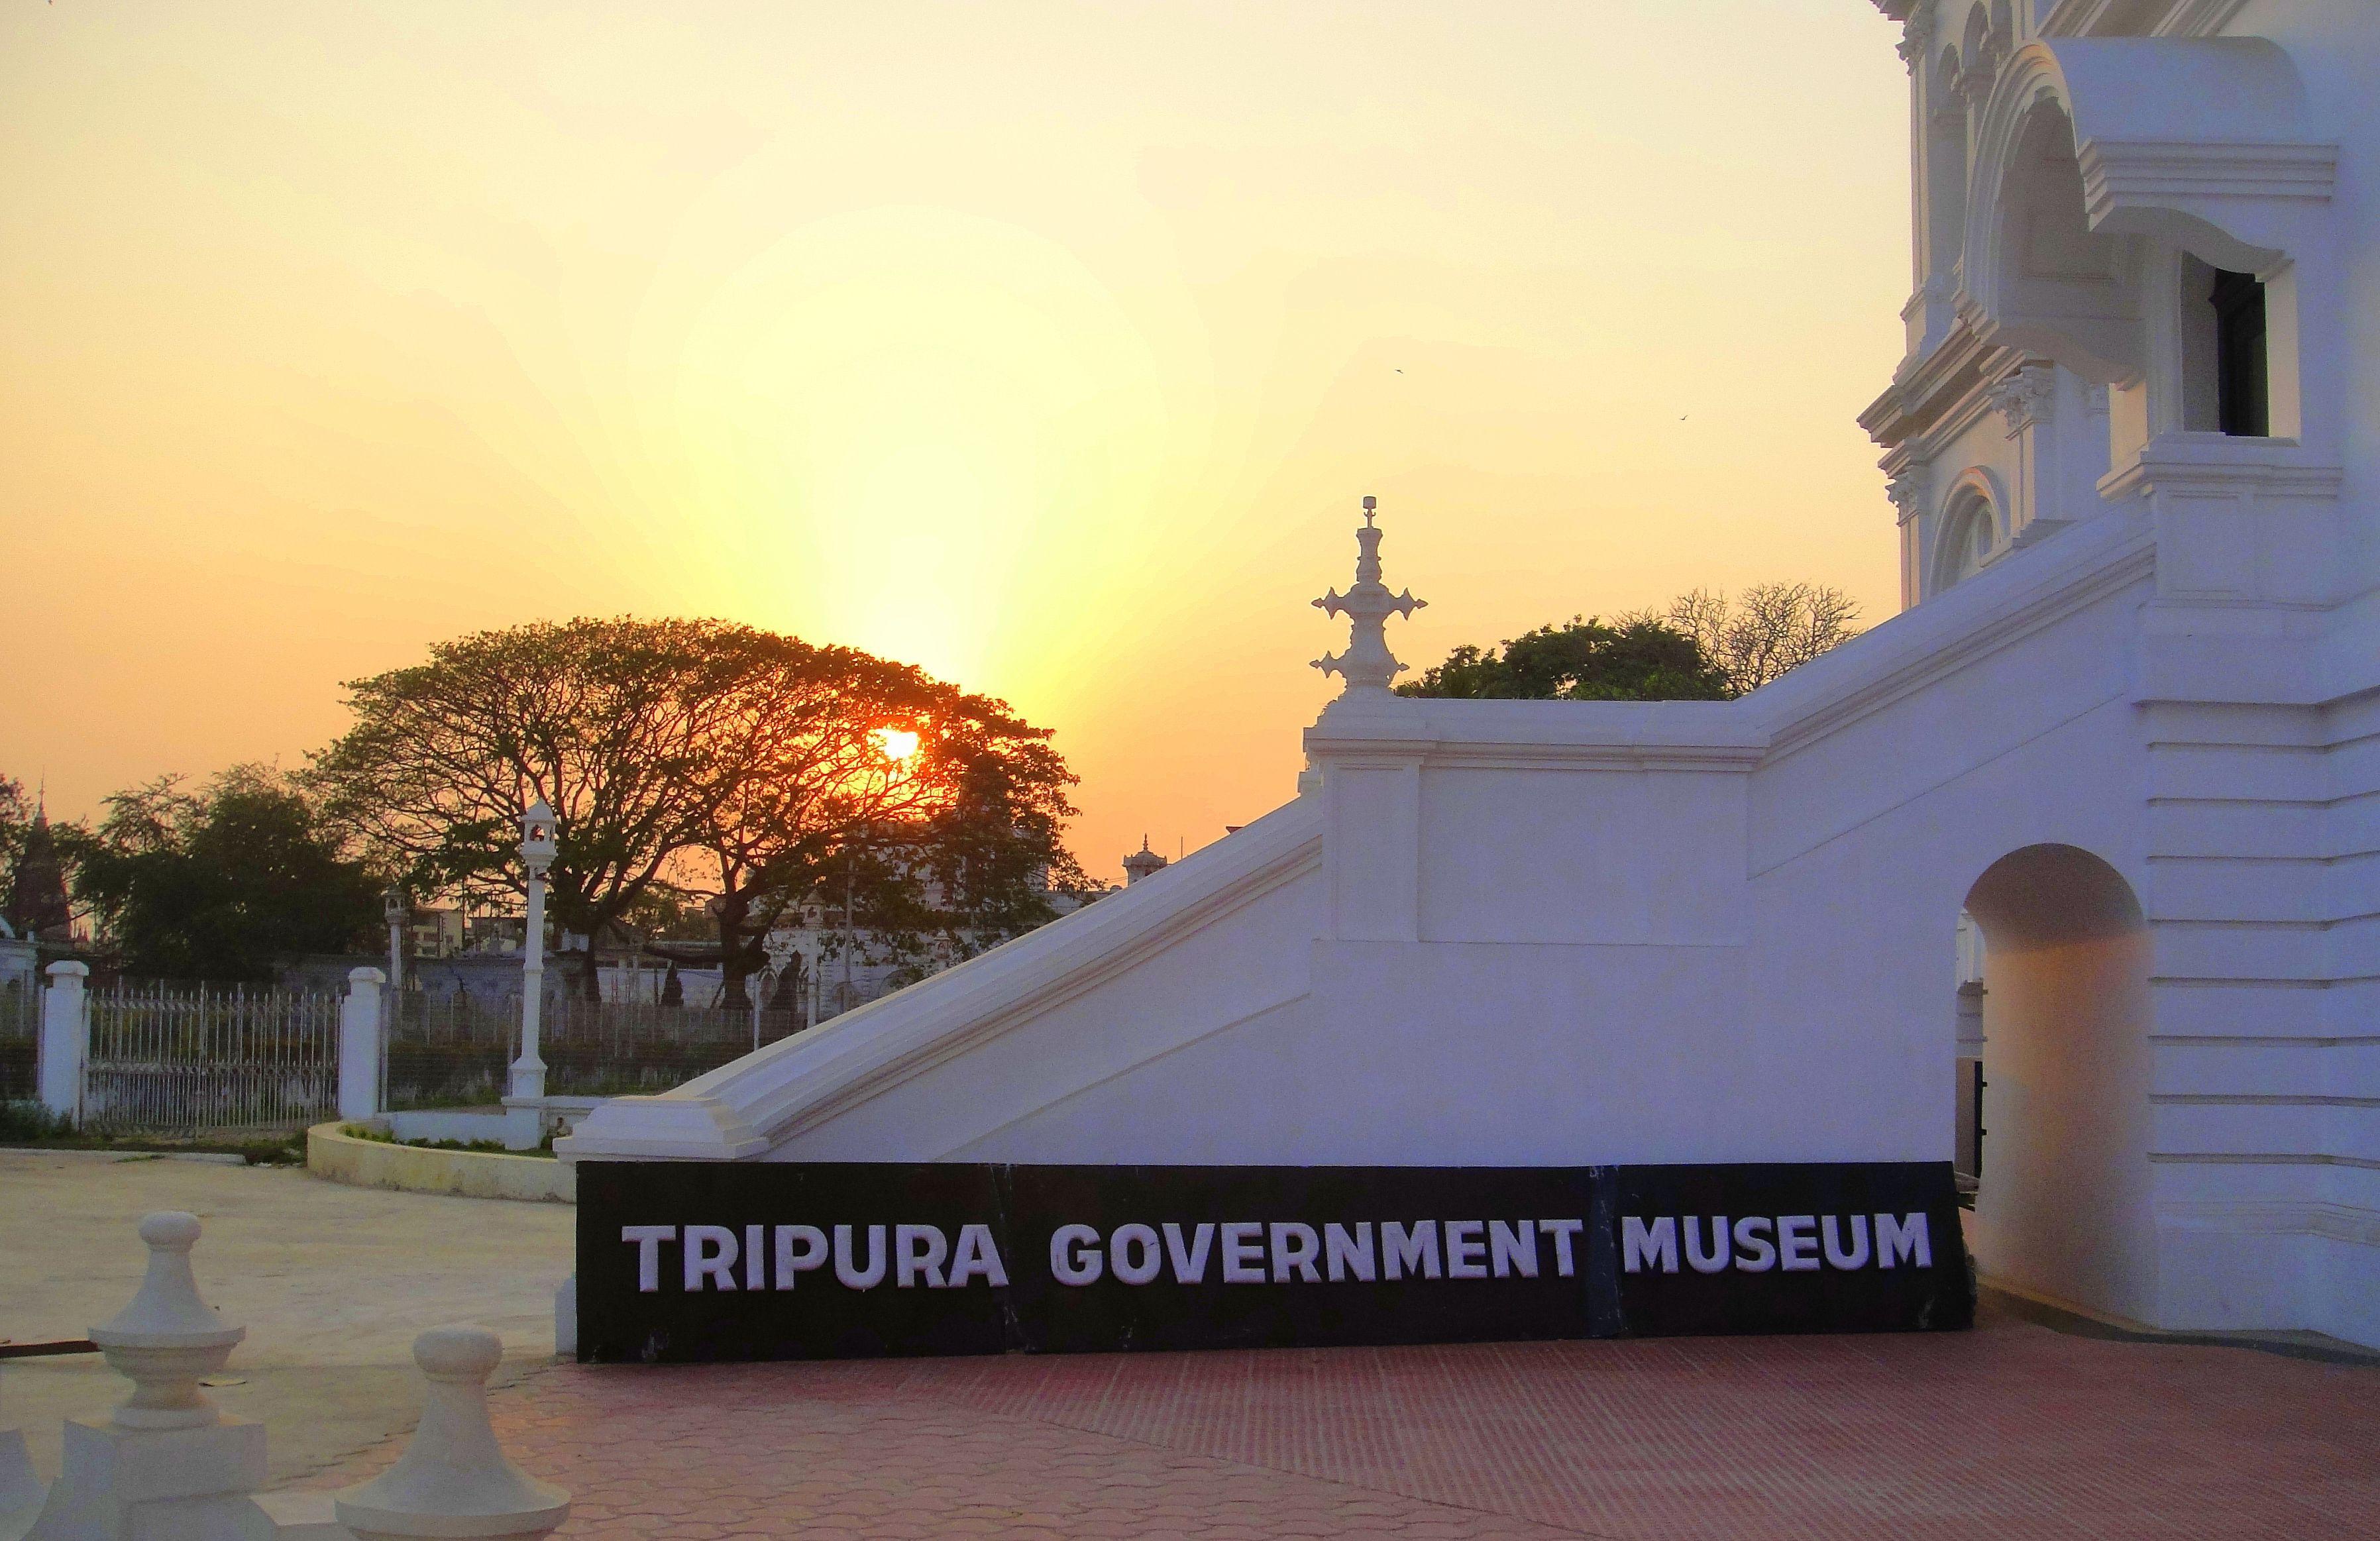 The Ujjayanta palace and museum. Tripura, India.